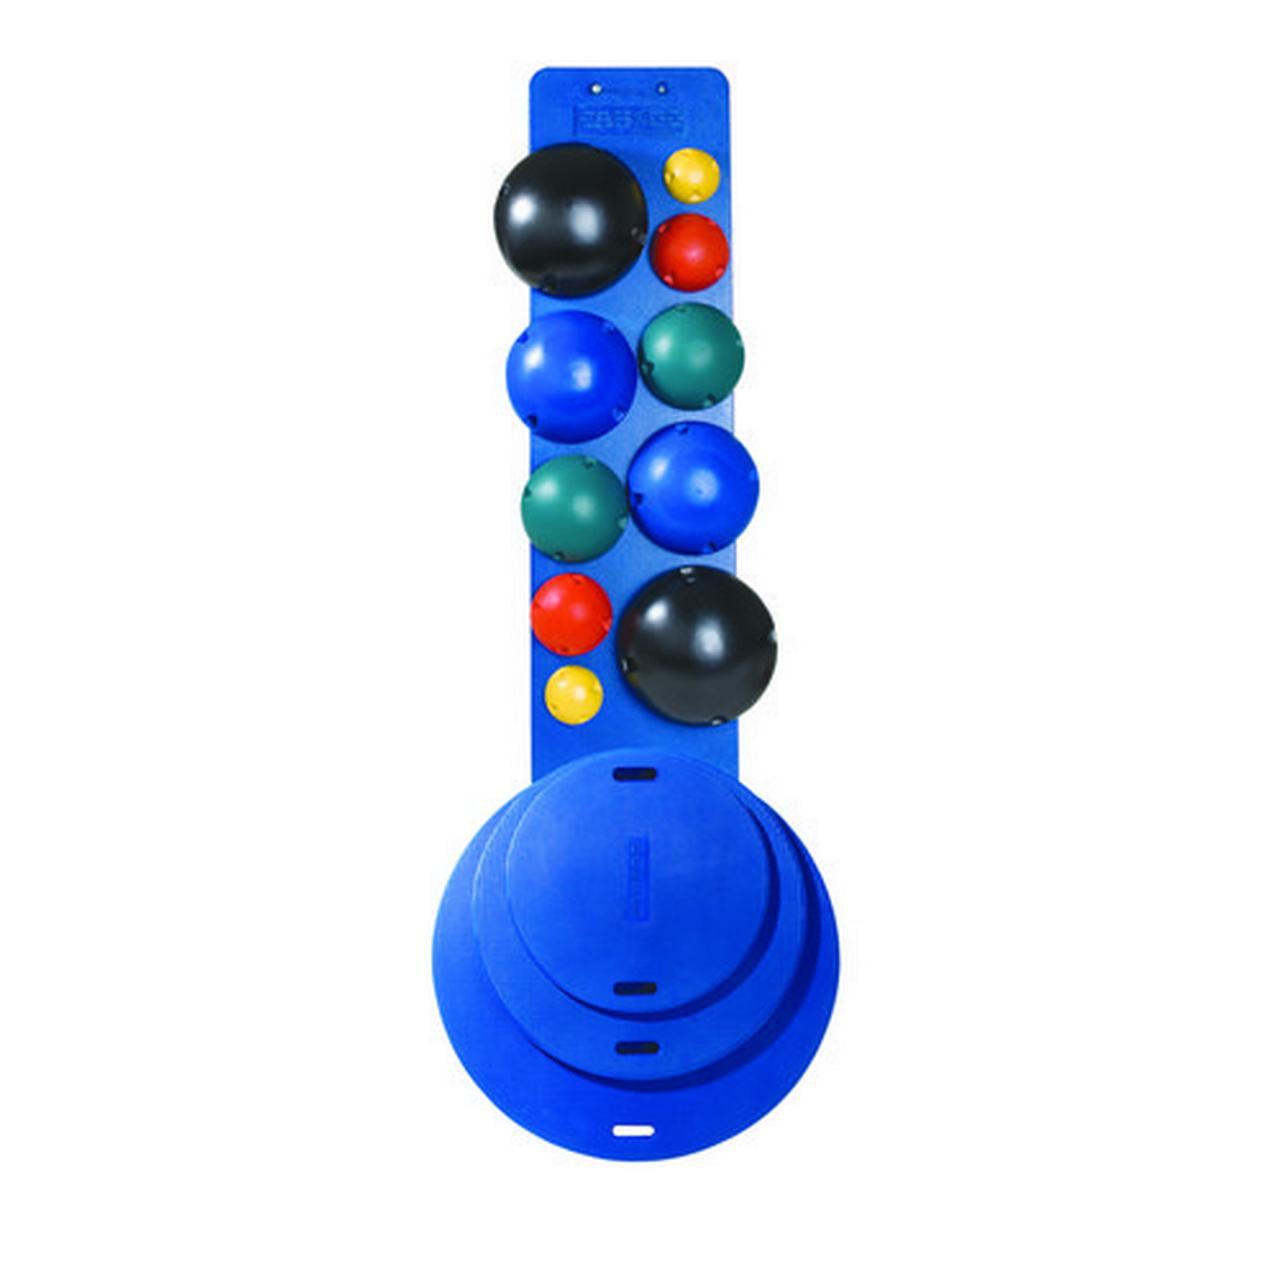 CanDo 10-1766 MVP Balance System 10-Ball Set 2 Each Yellow Through Black No Rack